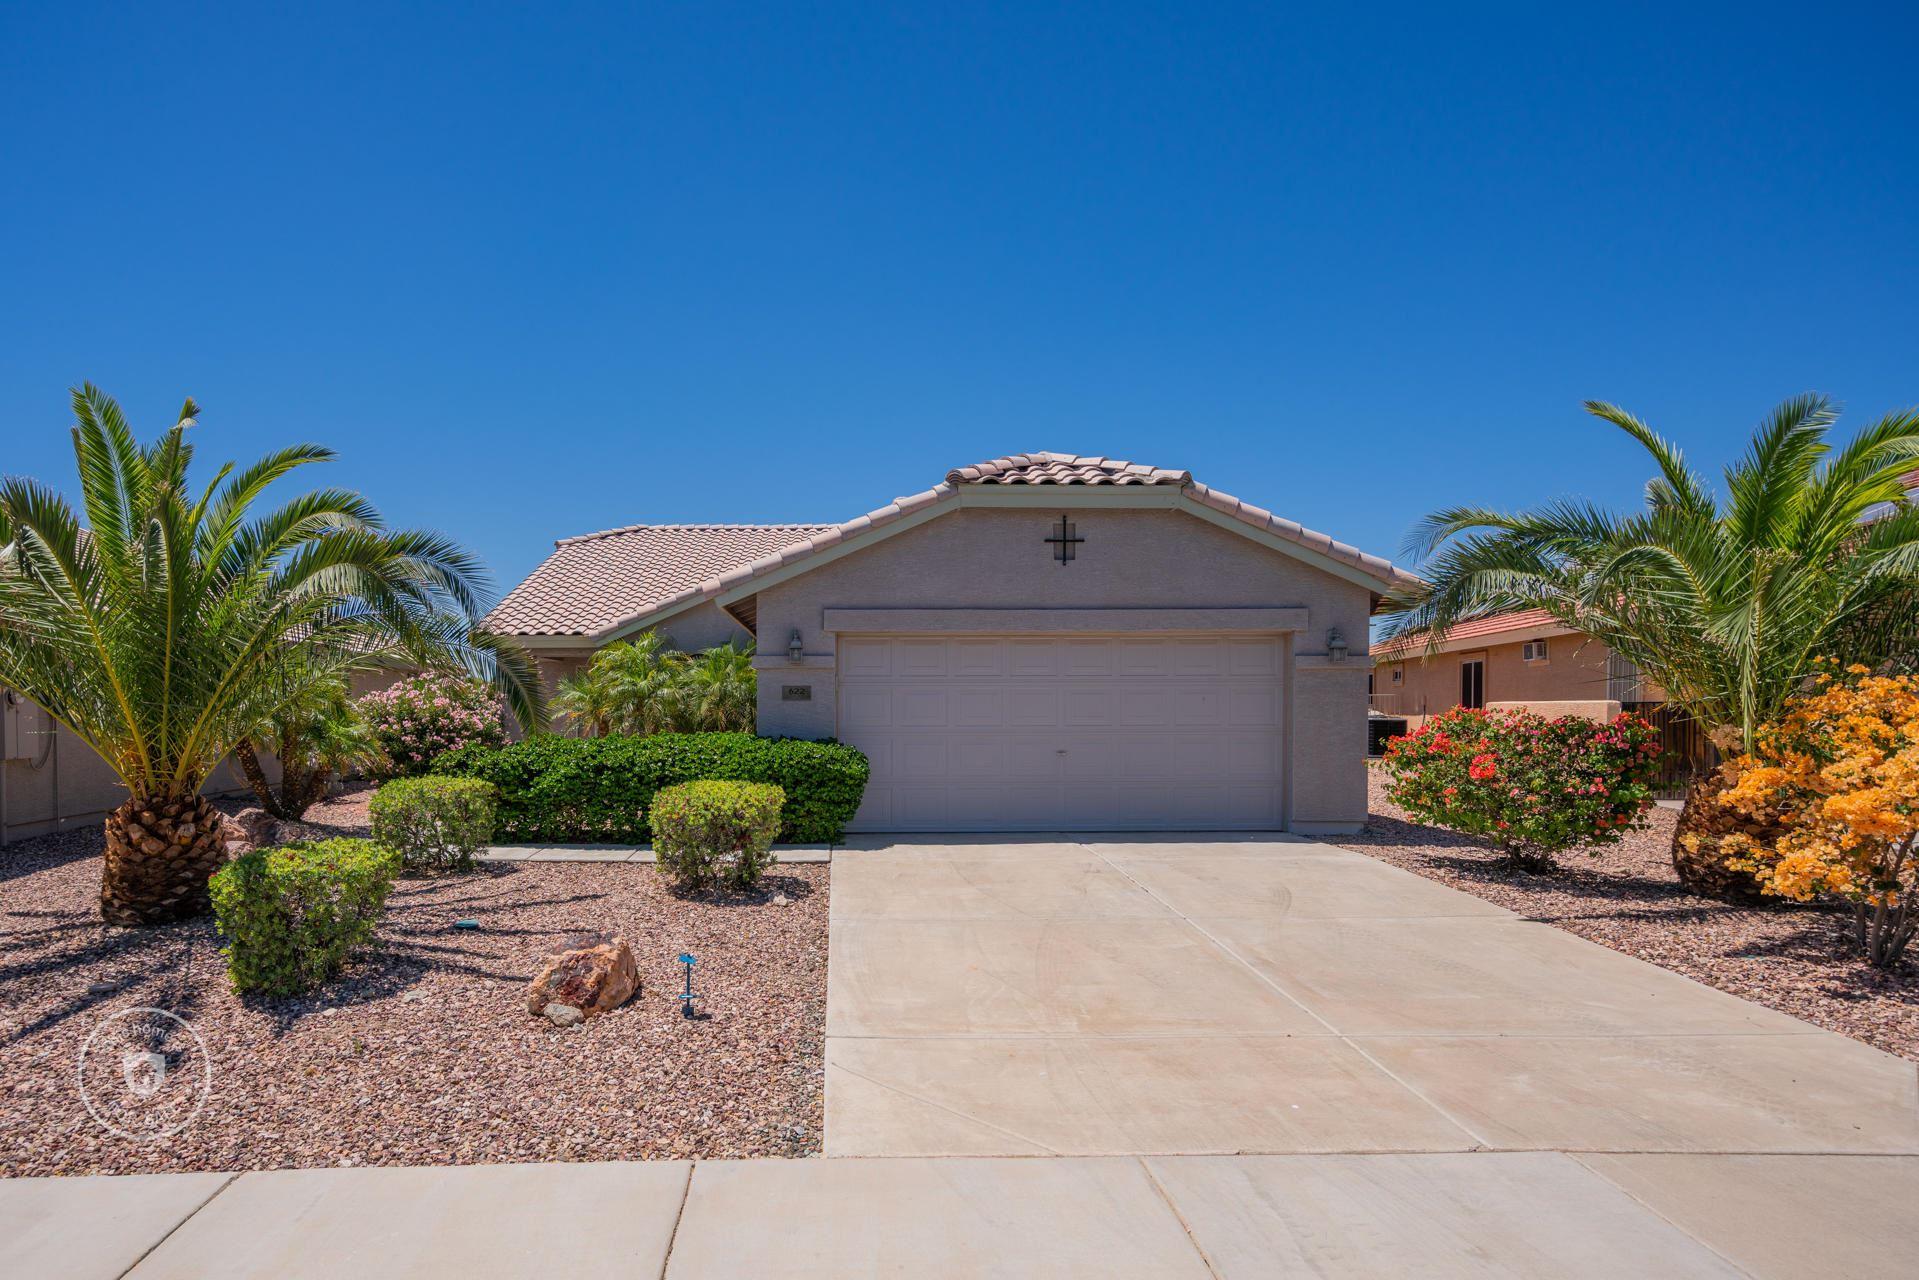 622 S 230TH Avenue, Buckeye, AZ 85326 - MLS#: 6230899